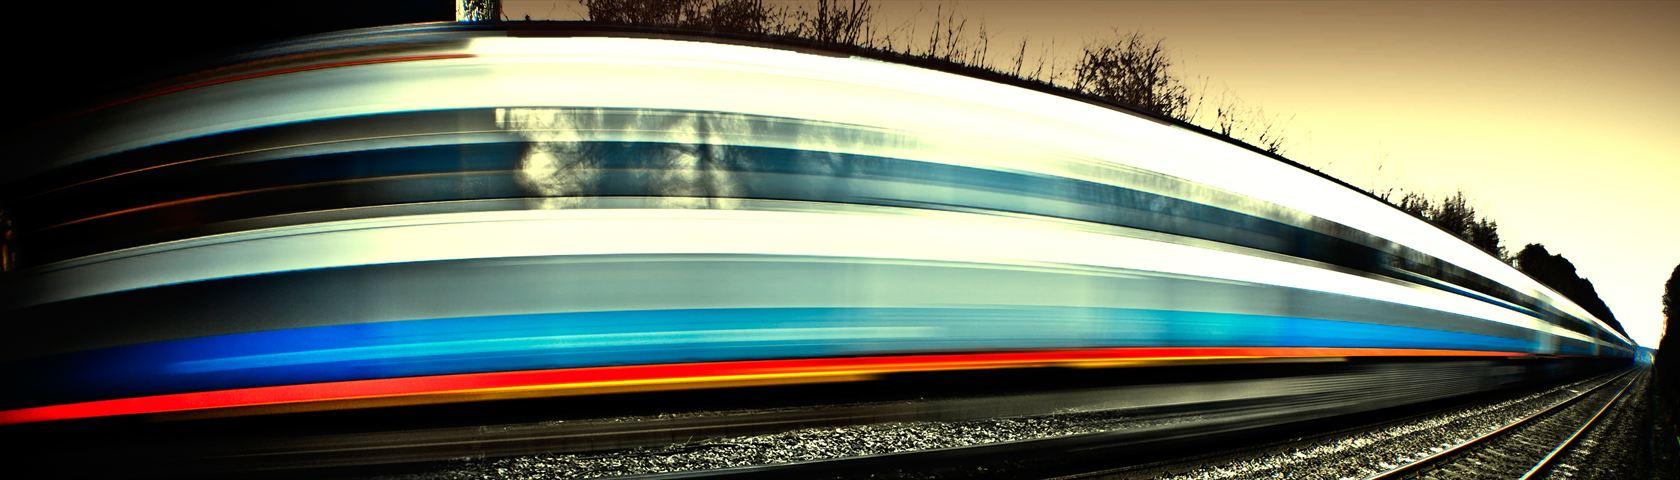 Trainswipe